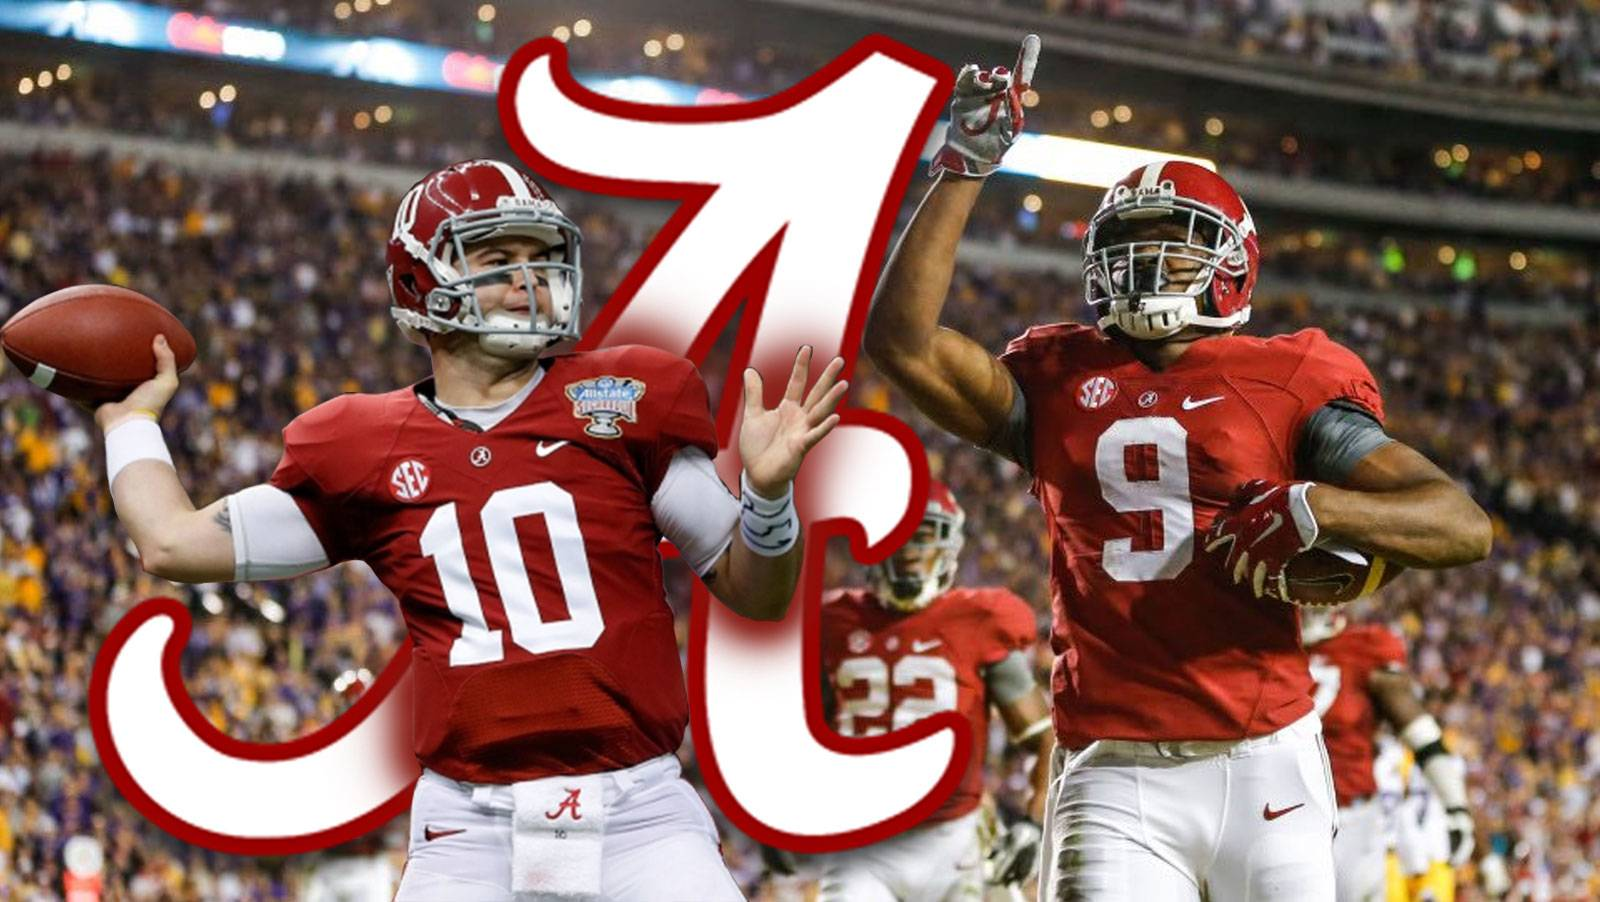 Alabama-Florida State highlights week 1 college football slate